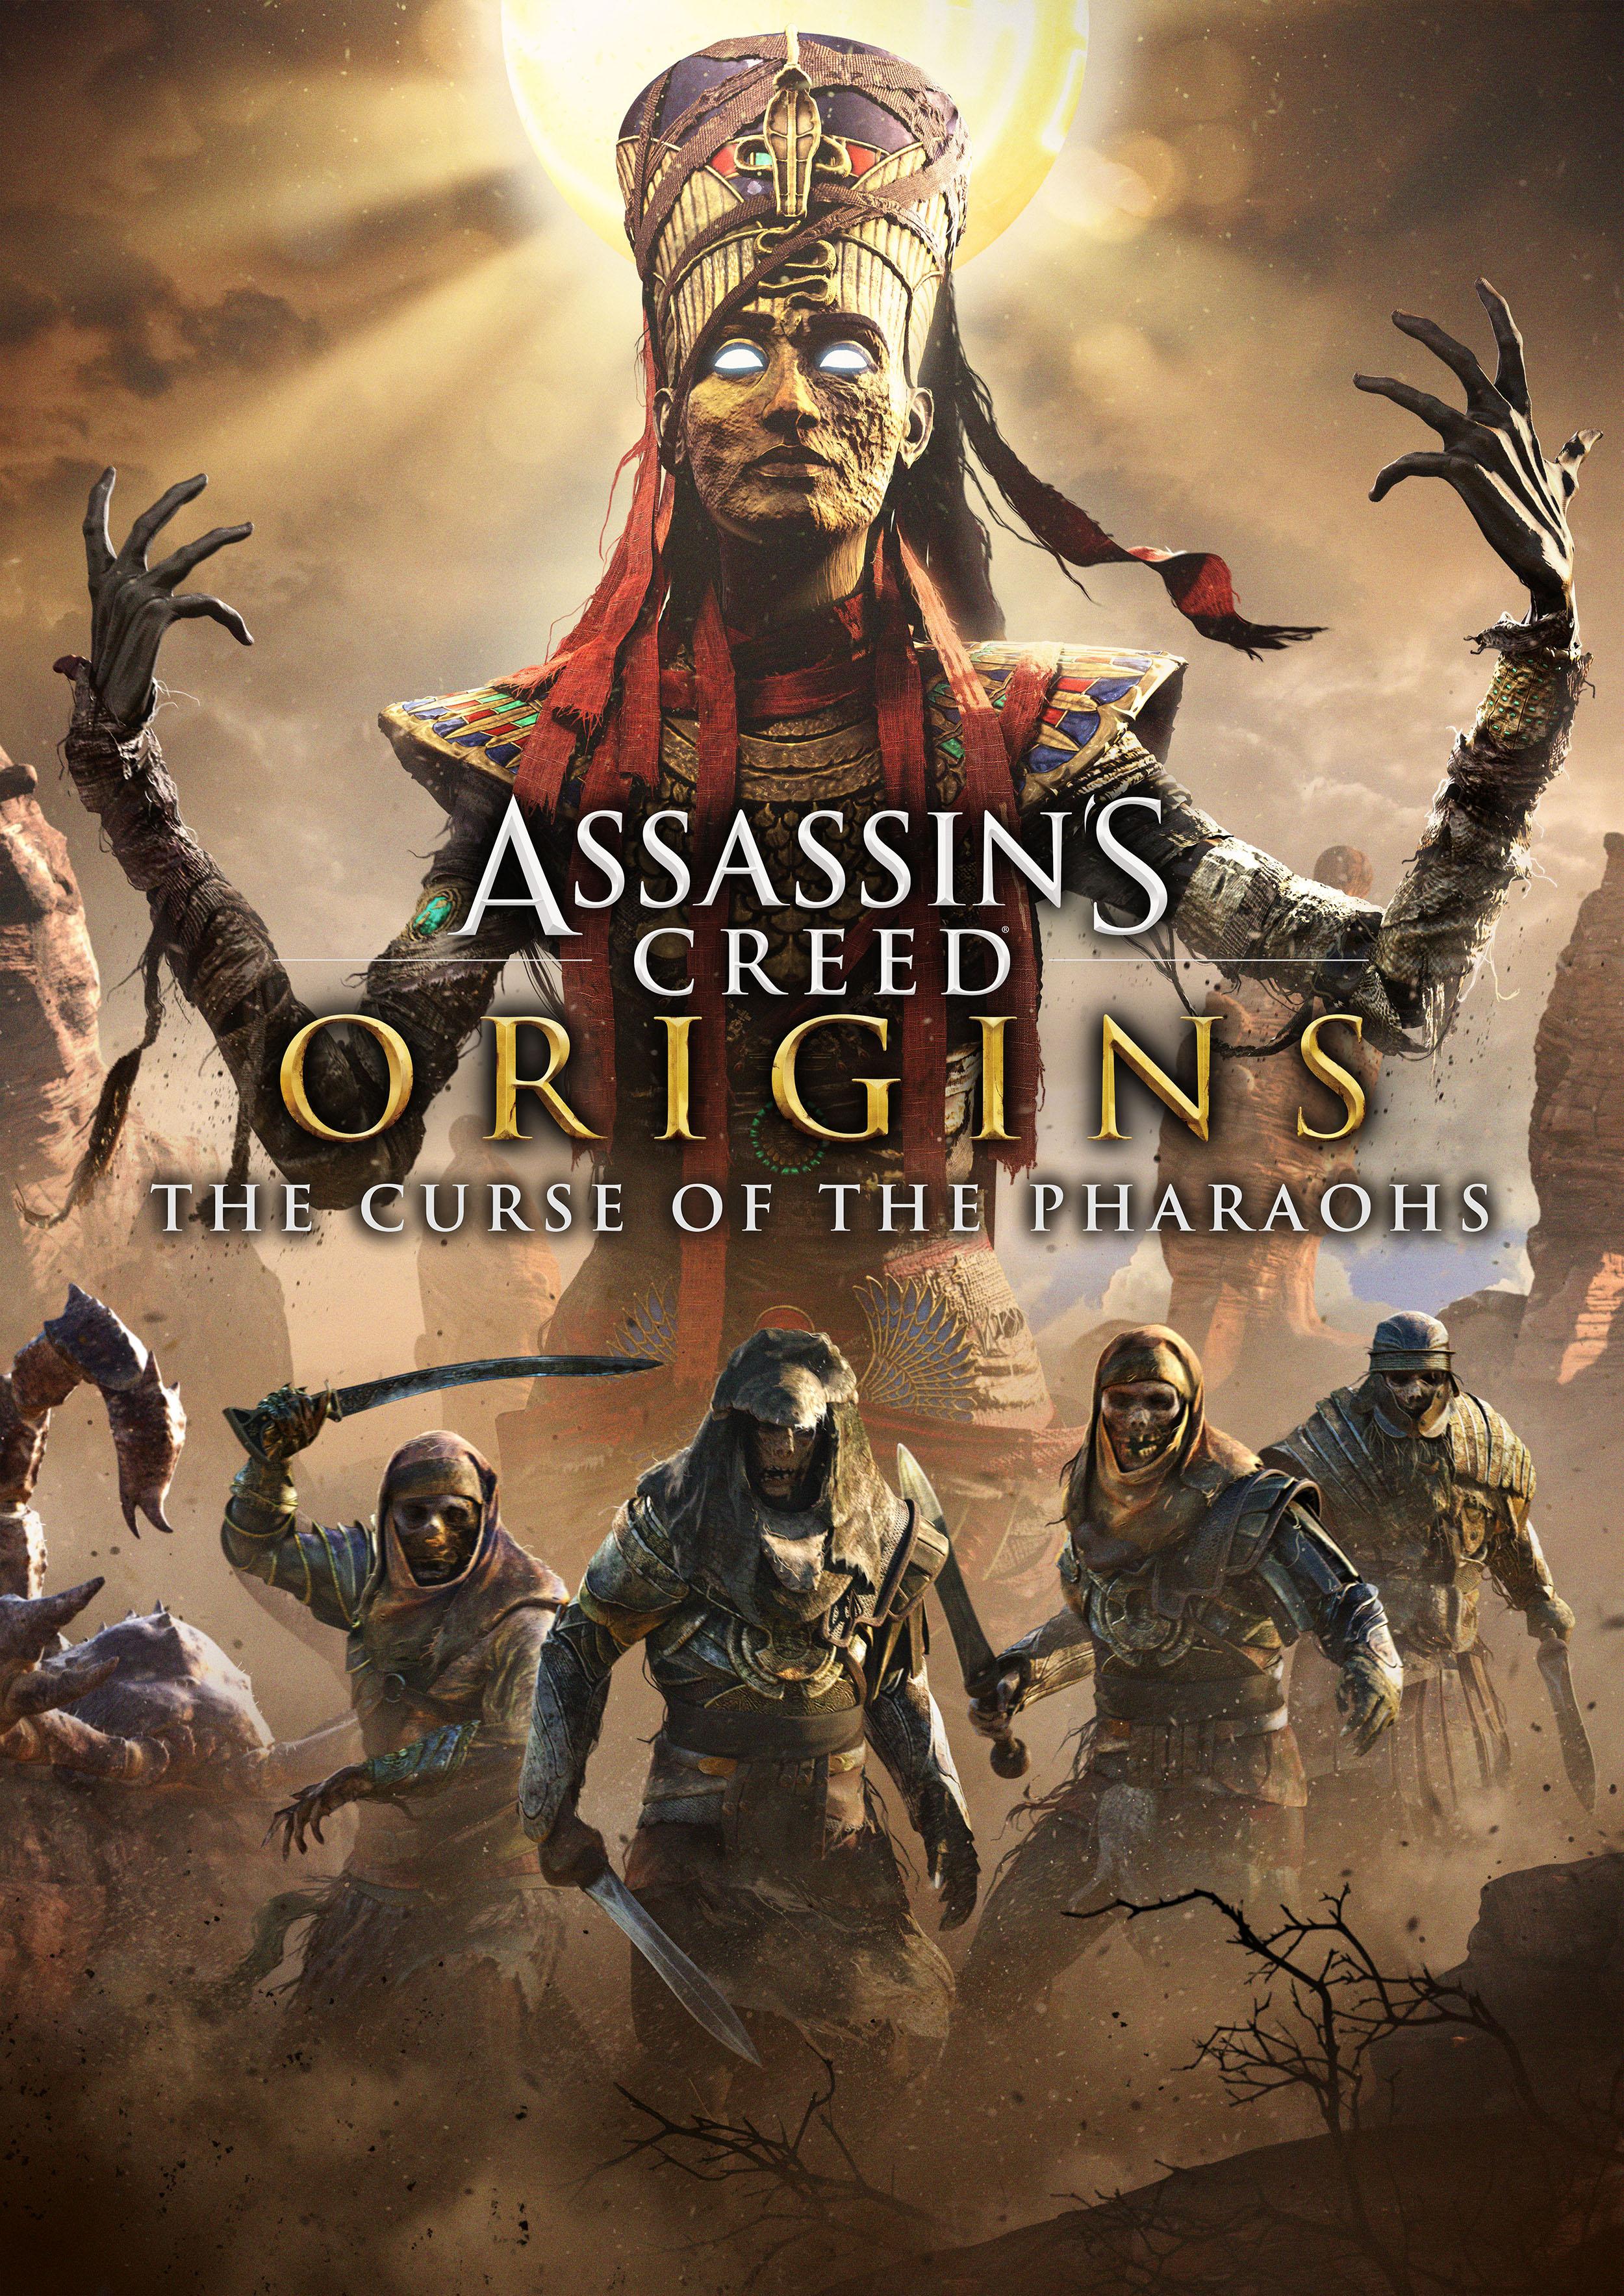 The Curse Of The Pharaohs Assassins Creed Wiki Fandom